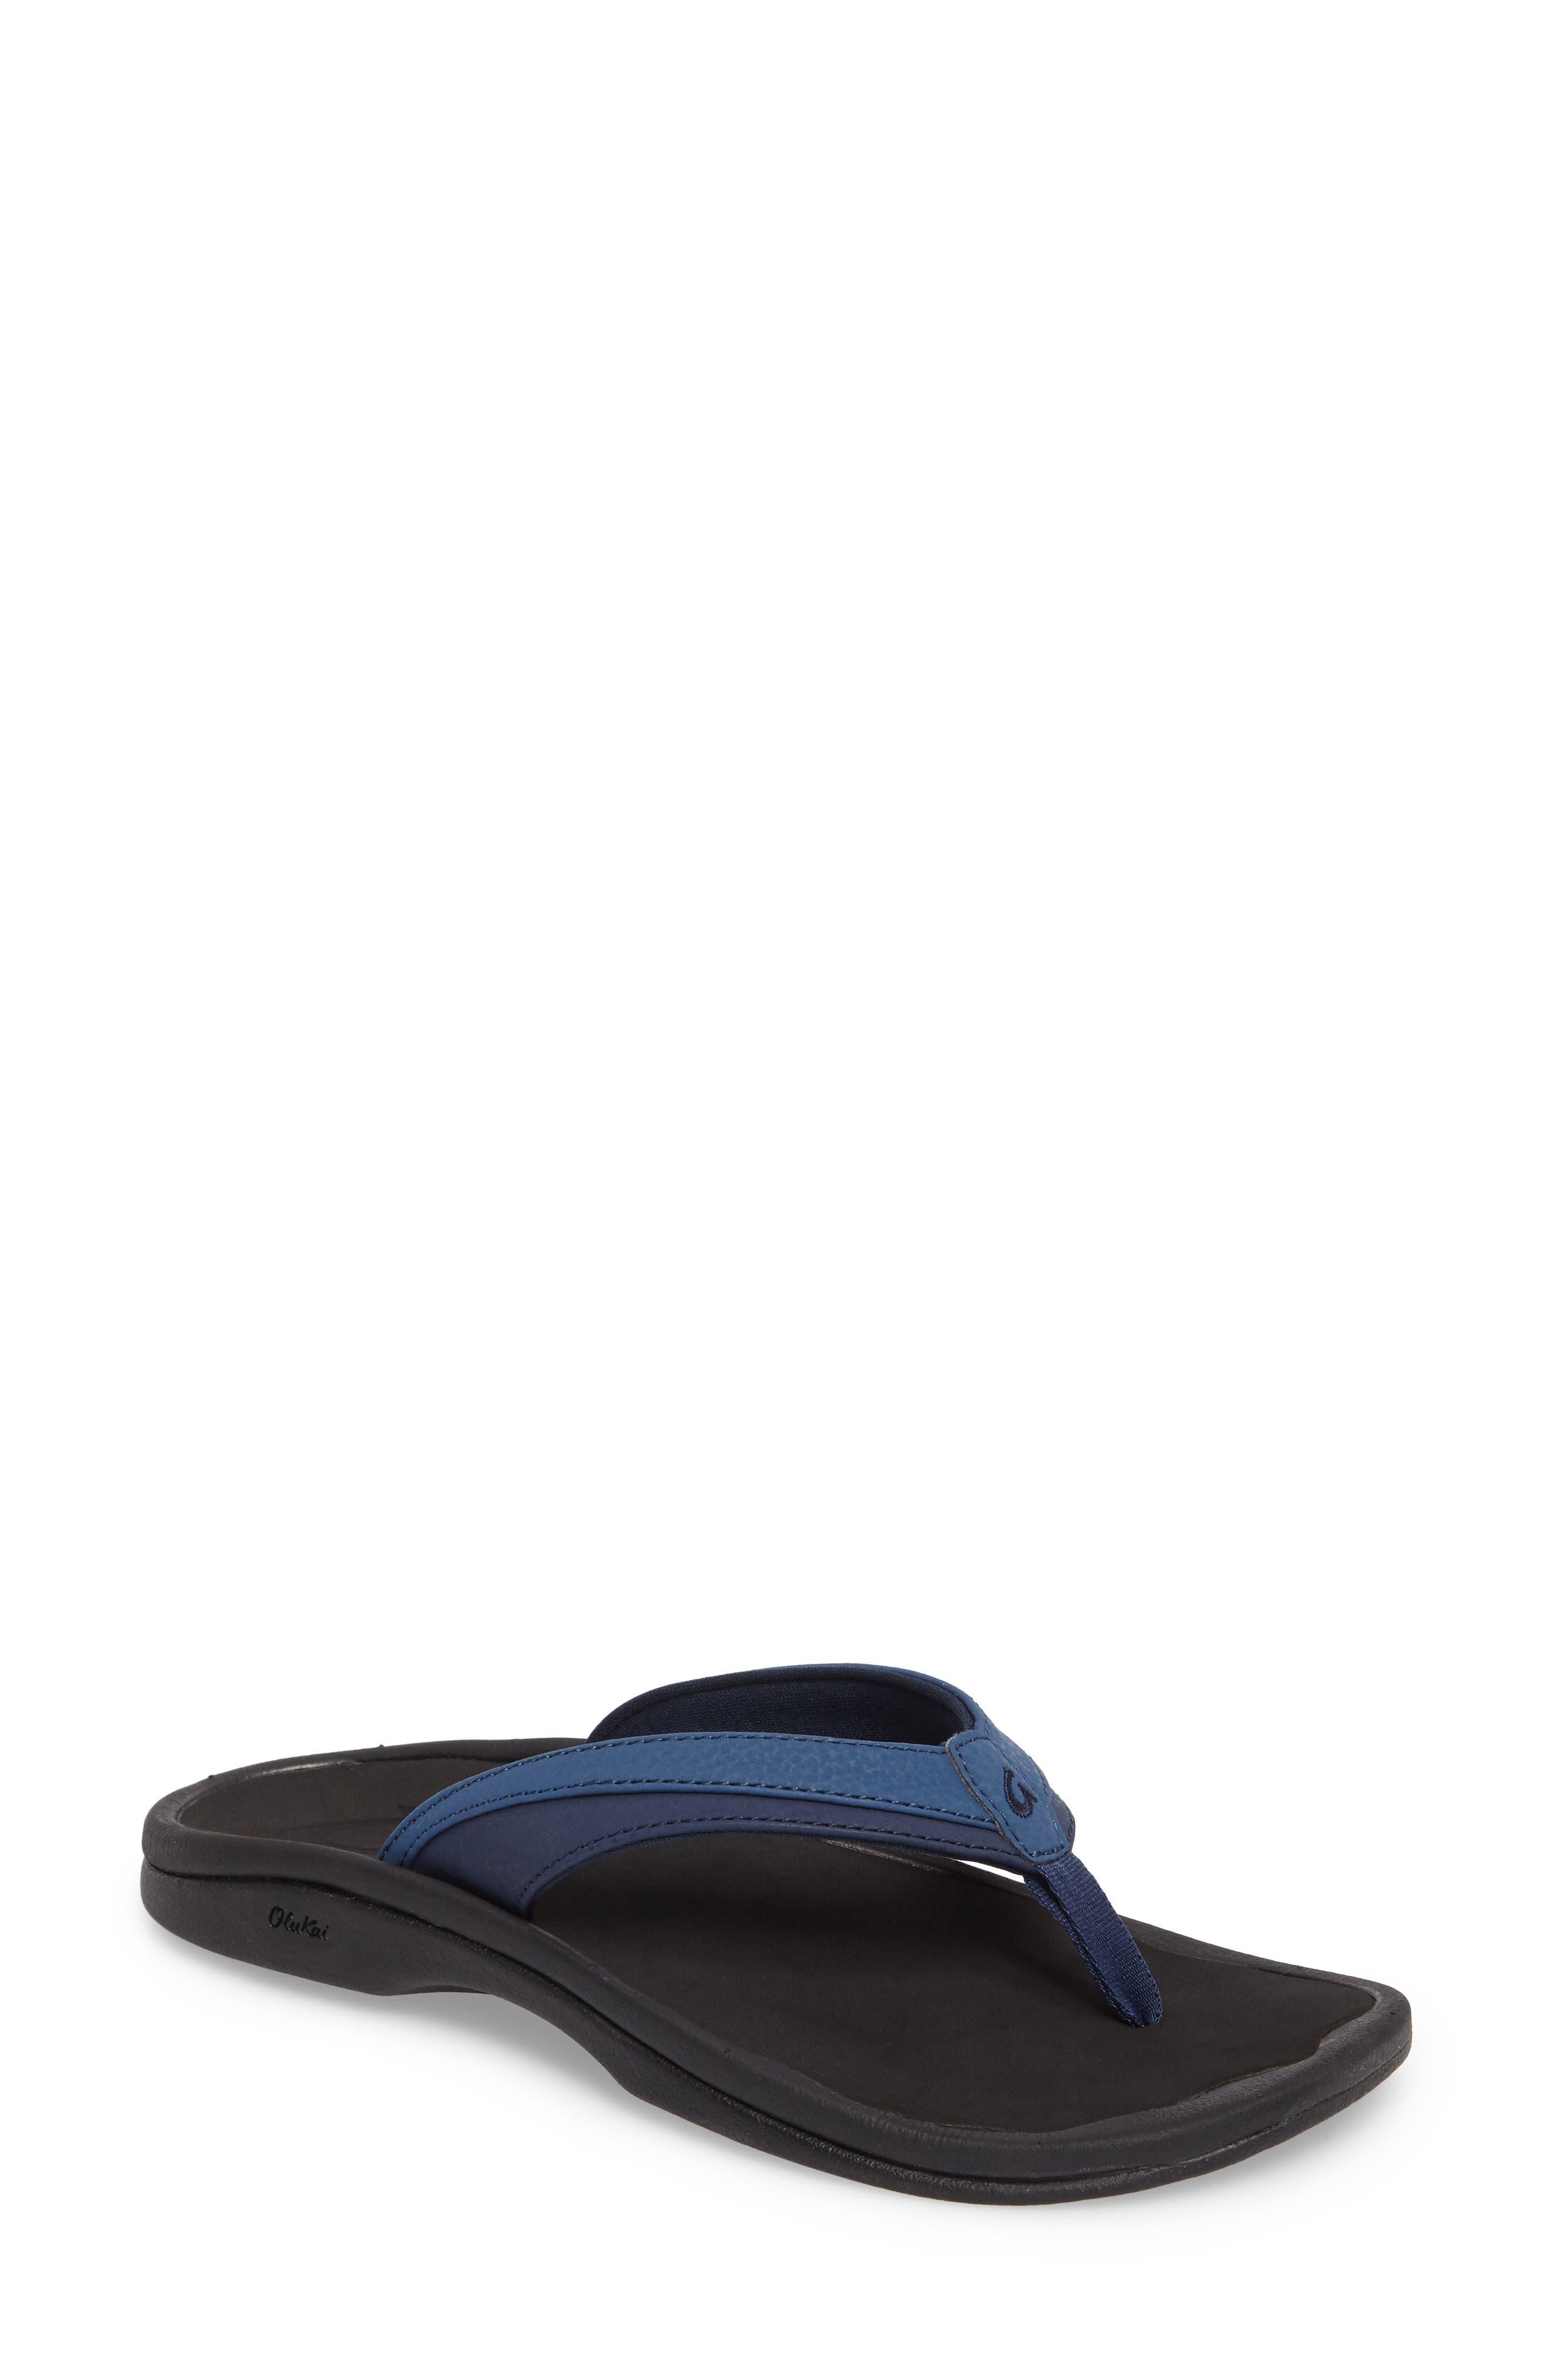 Ohana Sandal,                         Main,                         color, BLUEBERRY/ BLACK FAUX LEATHER